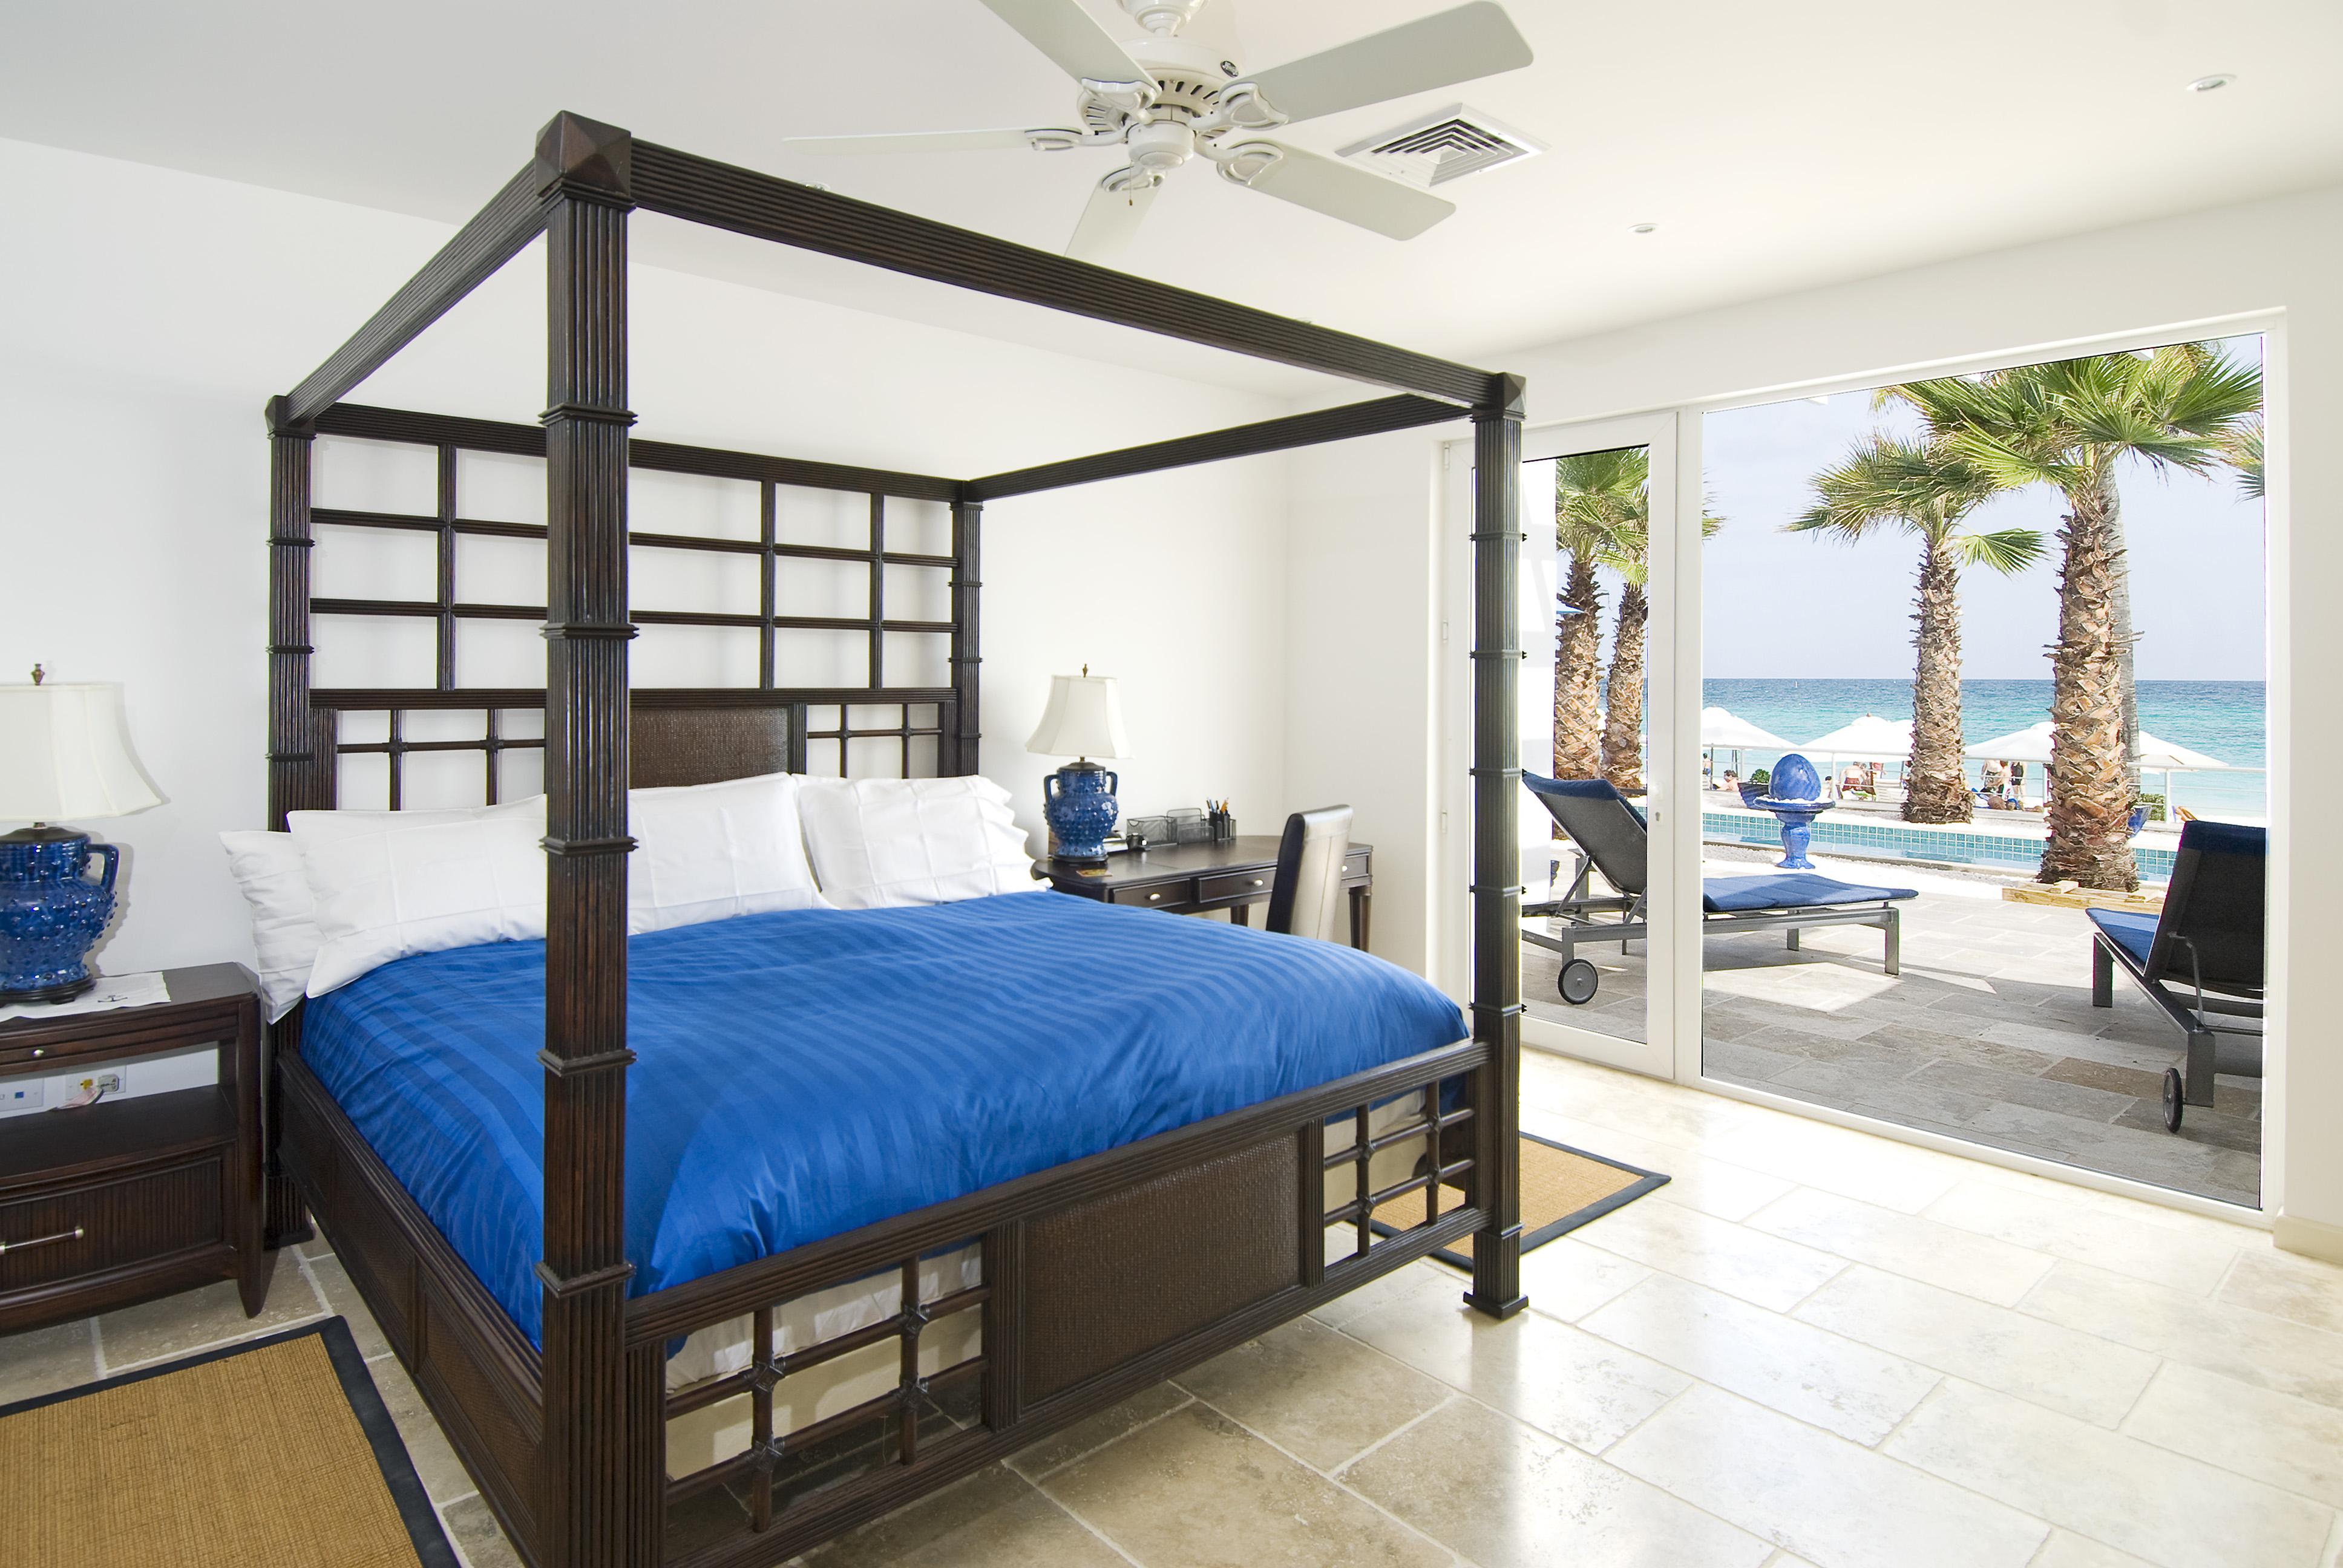 SM388 Beachfront Villa Bedroom